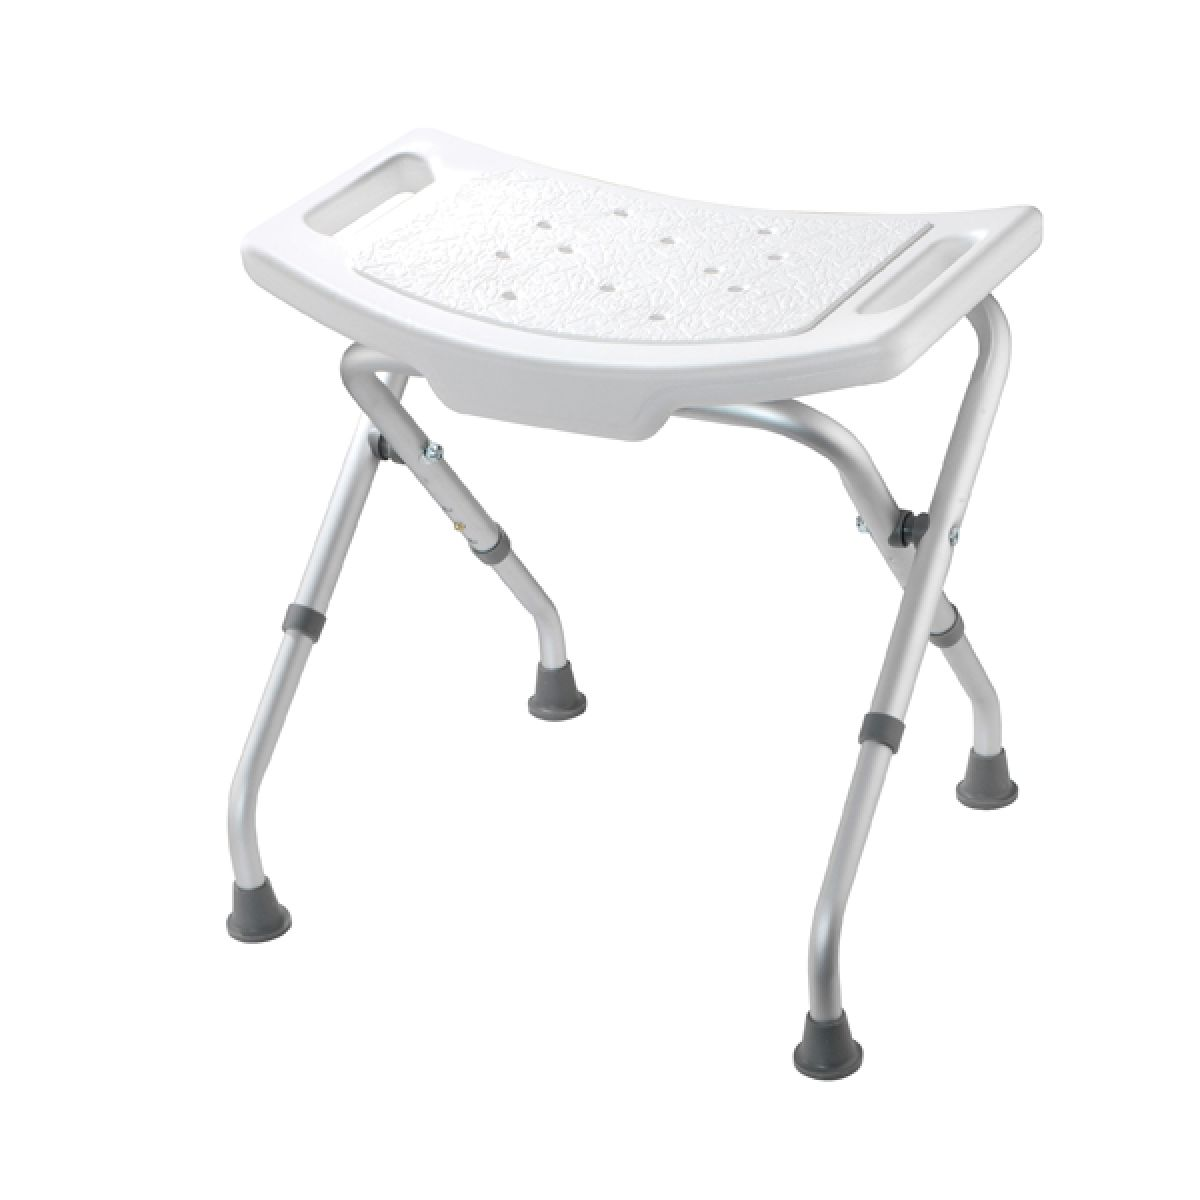 Croydex Adjustable Bathroom and Shower Seat White